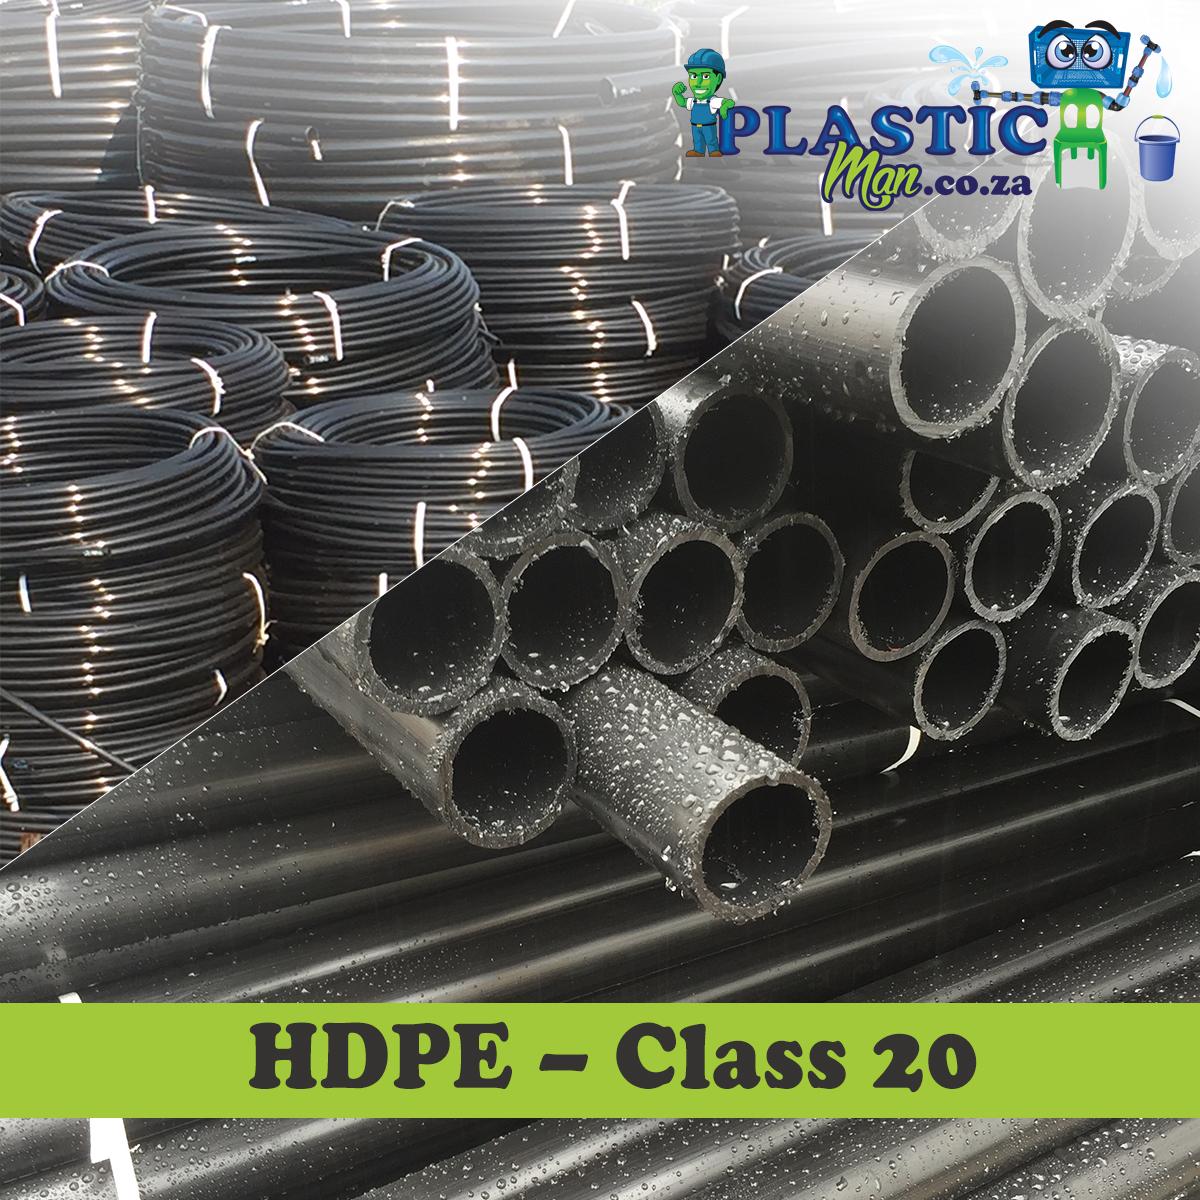 Plasticman HDPE Class 20 Pipe